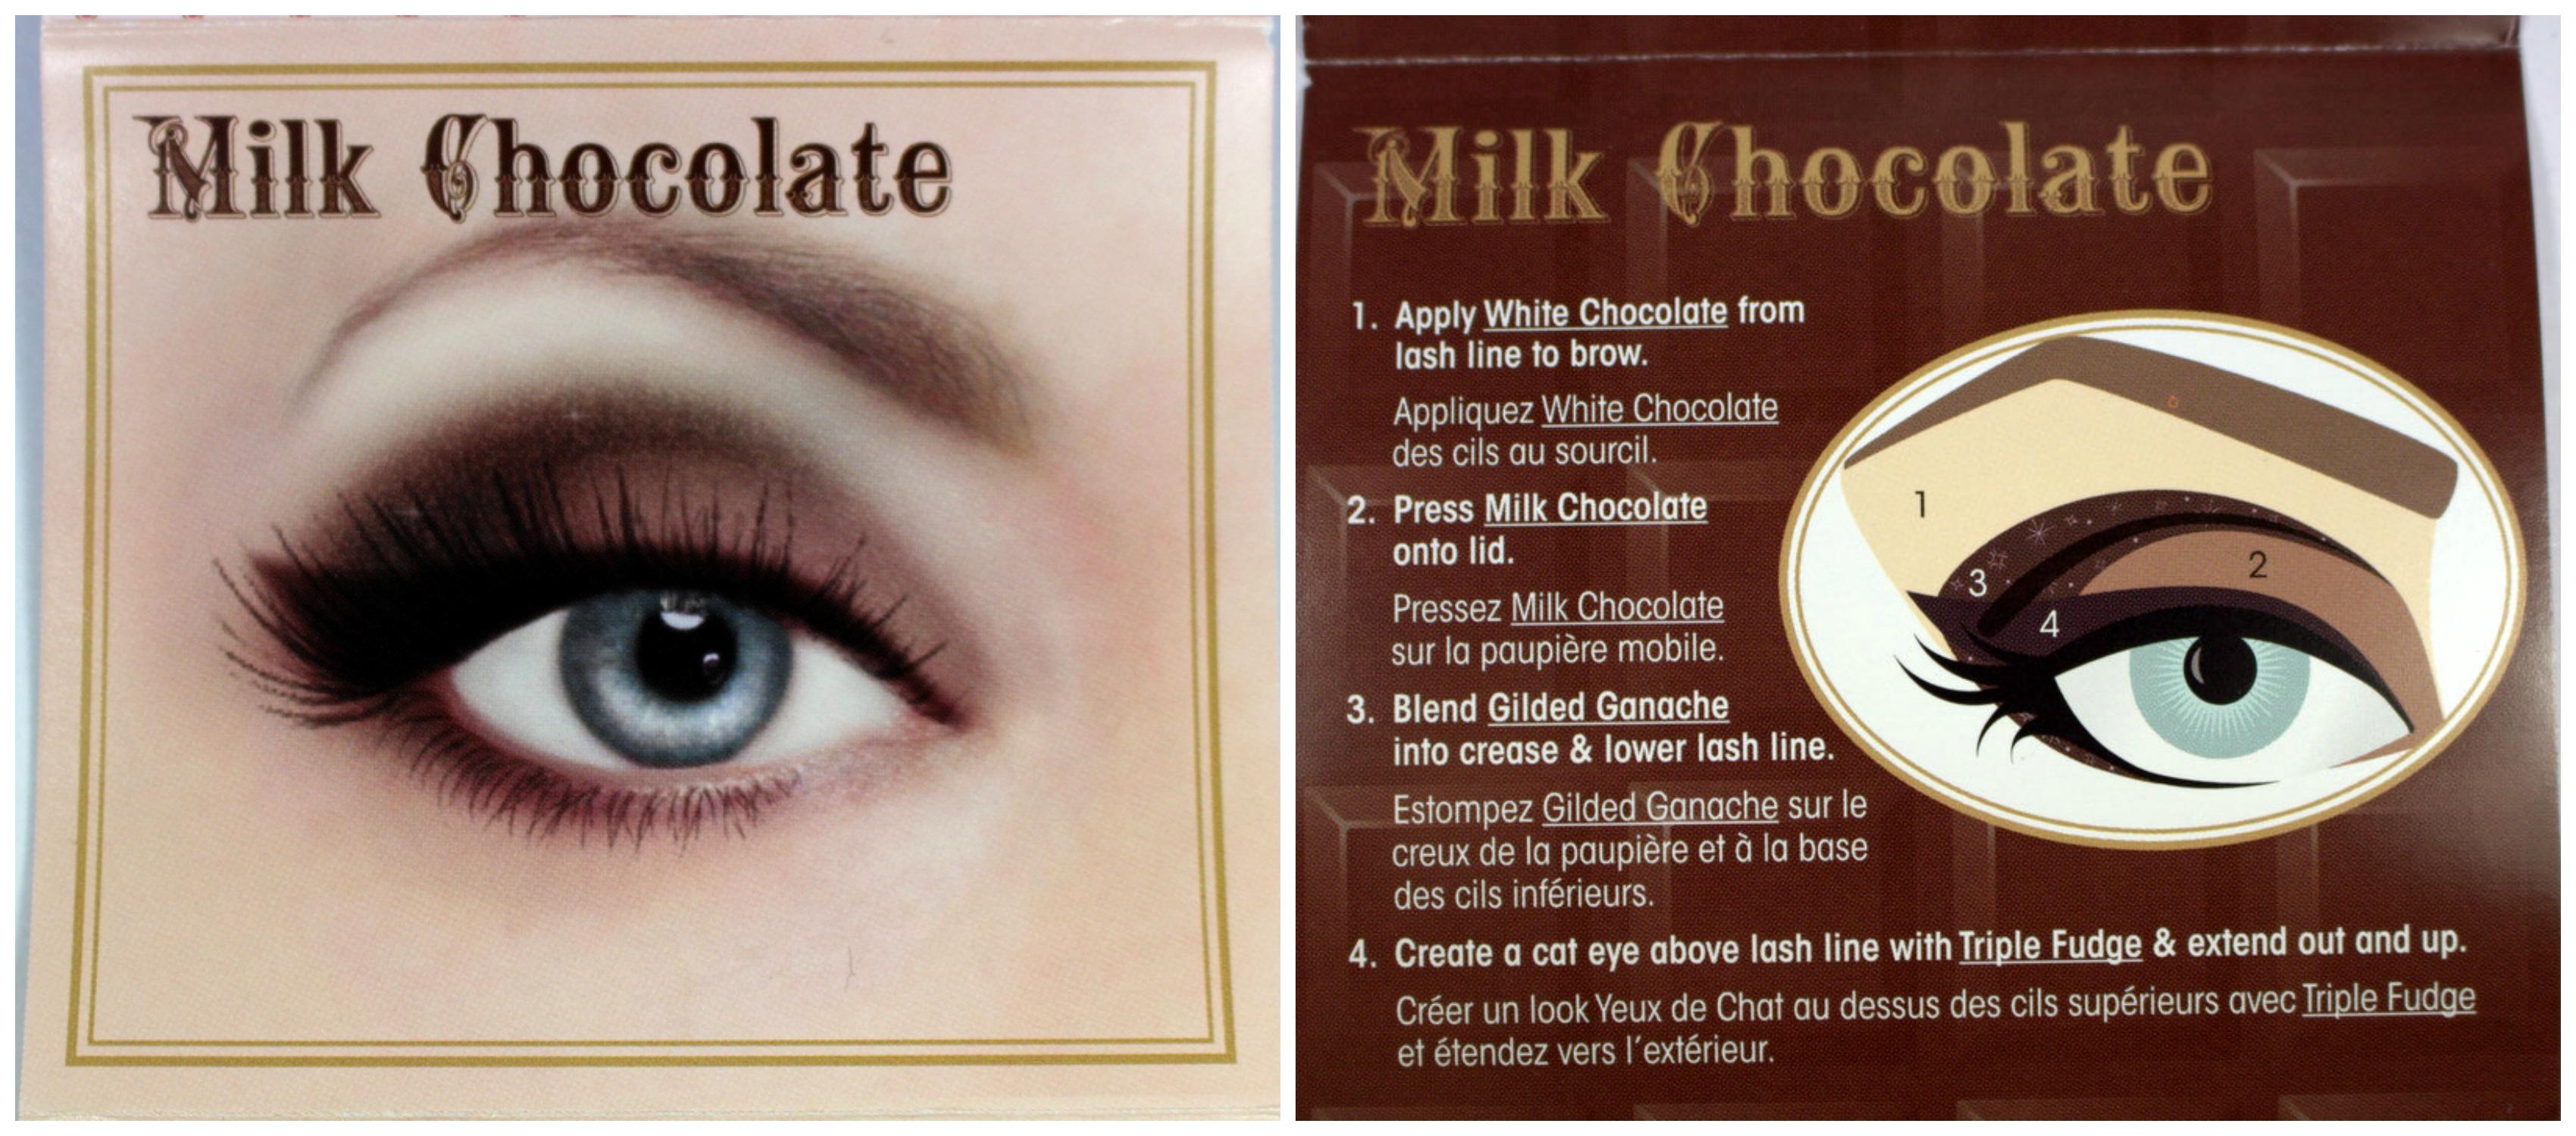 MILKchocolateCollage.jpg